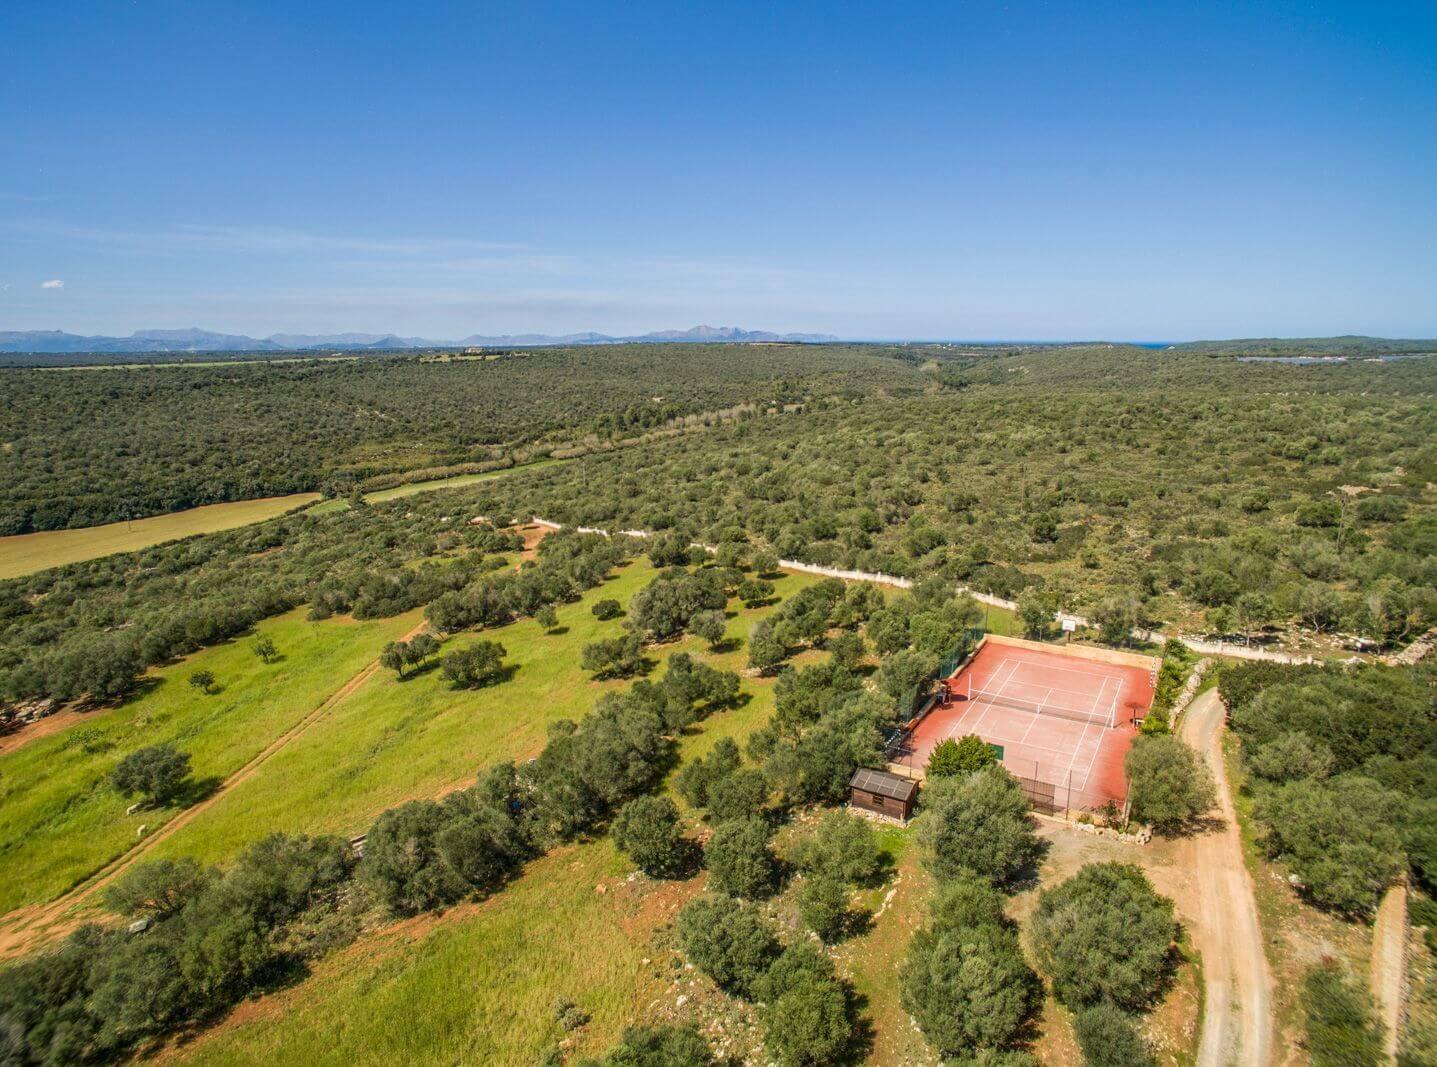 Mallorca Finca Melito - Tennisplatz